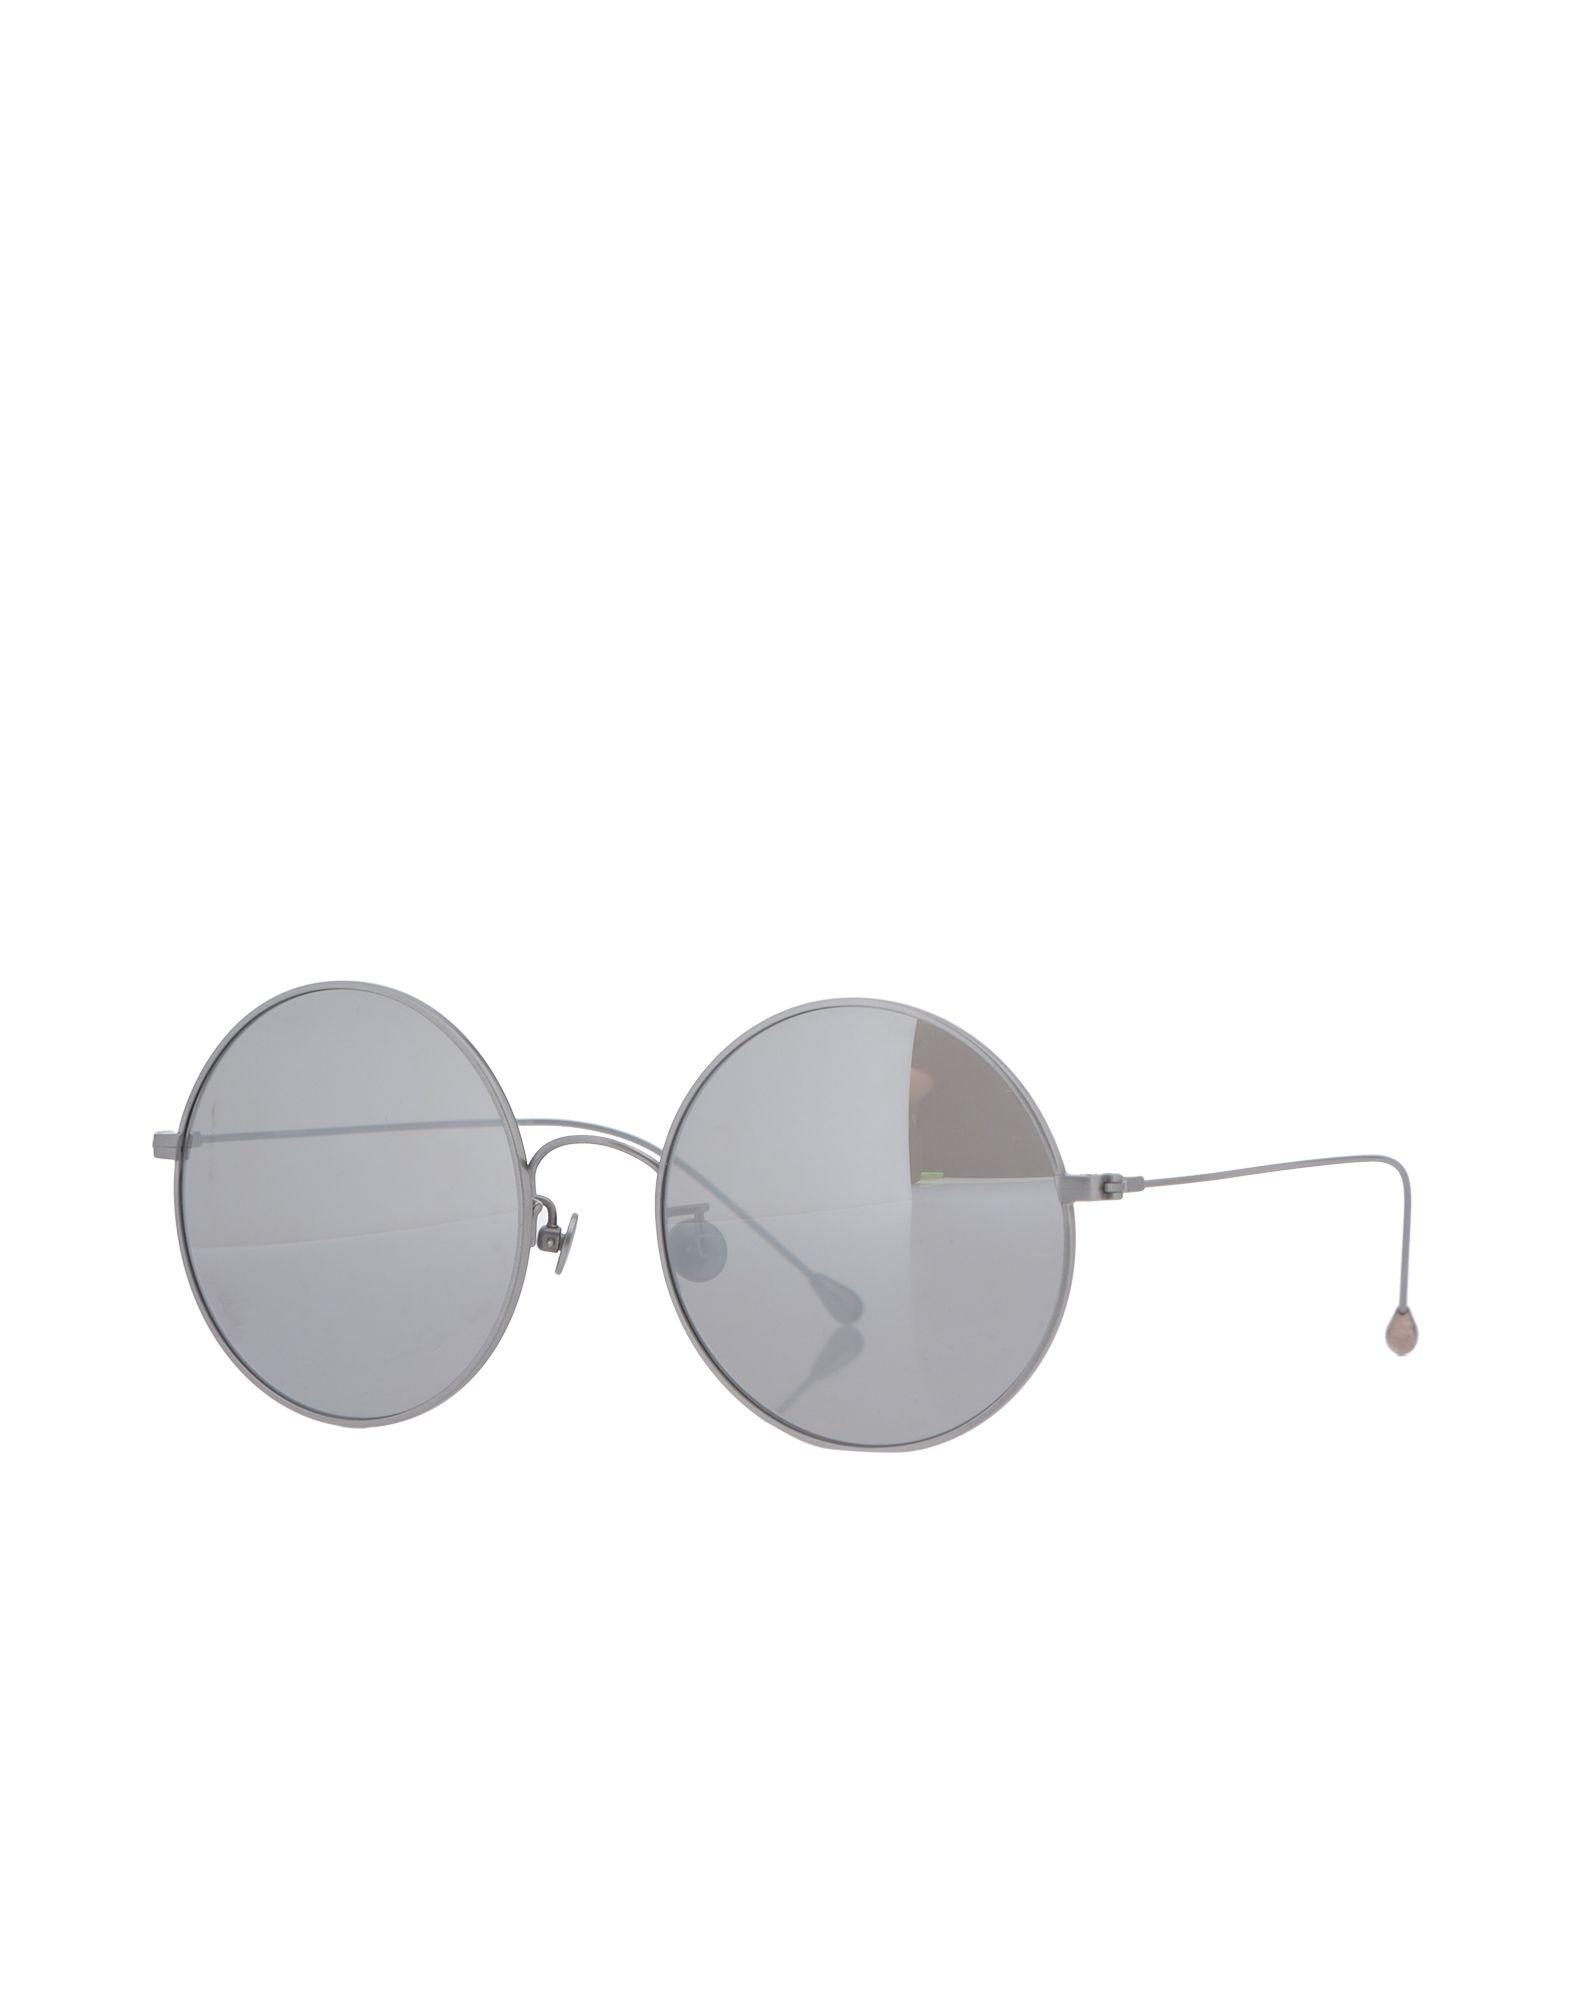 ANN DEMEULEMEESTER Солнечные очки